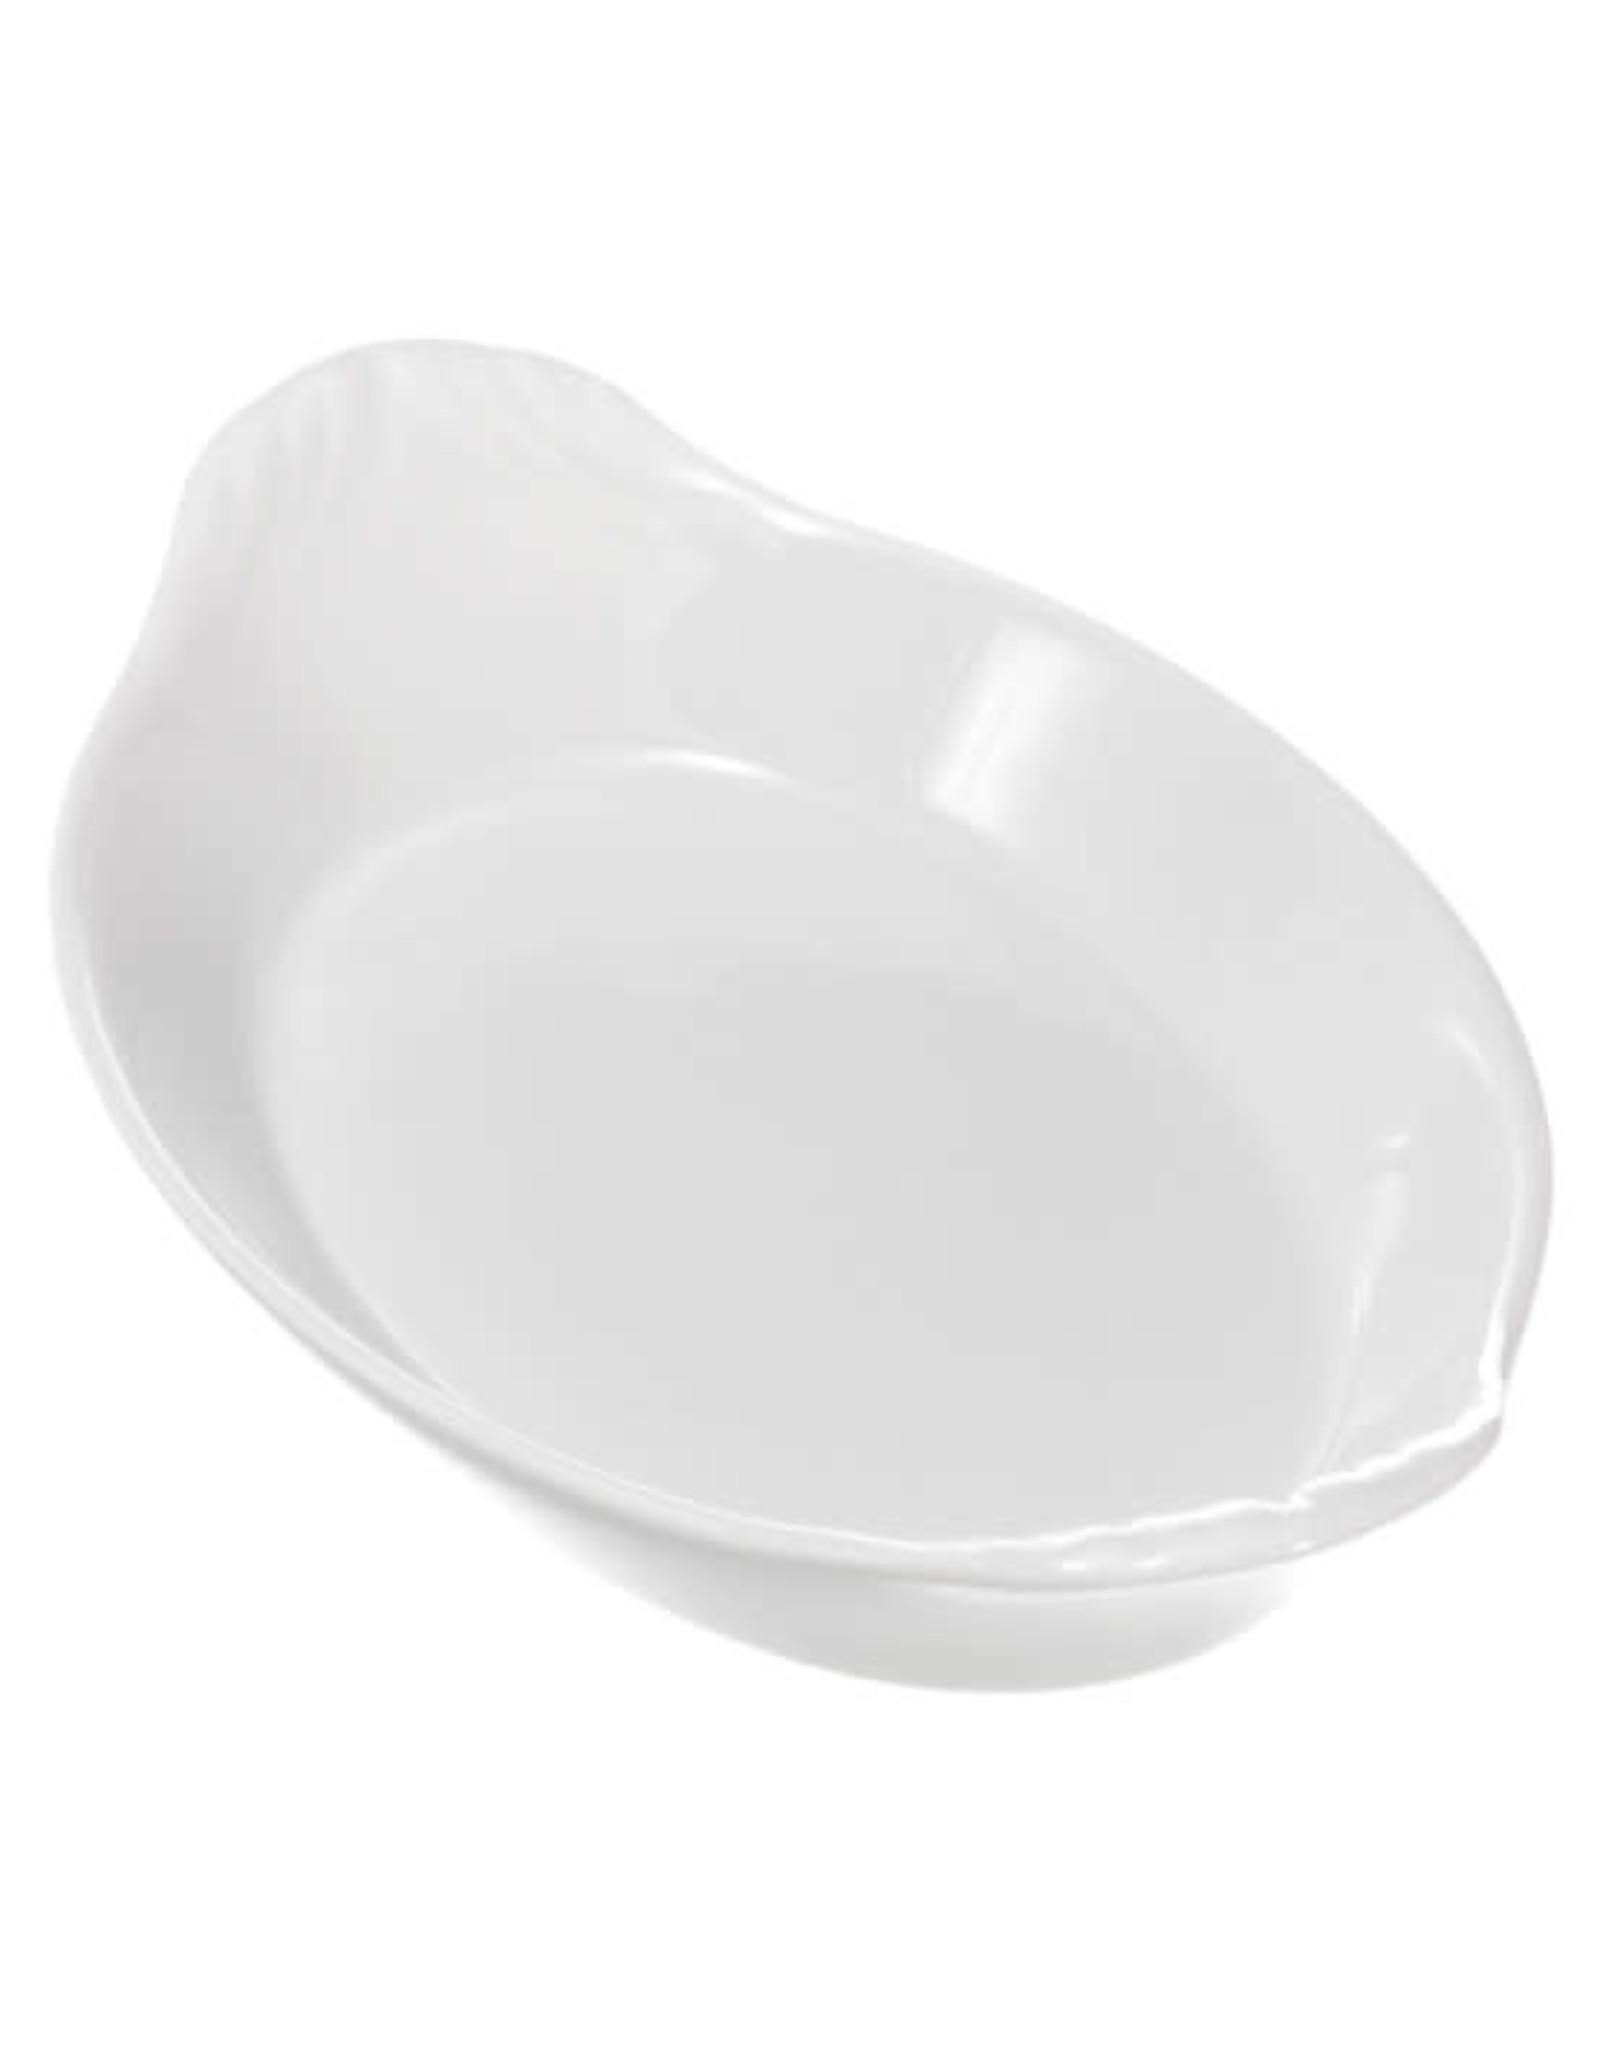 Pillivuyt USA PILLIVUYT Oval earred dish mini